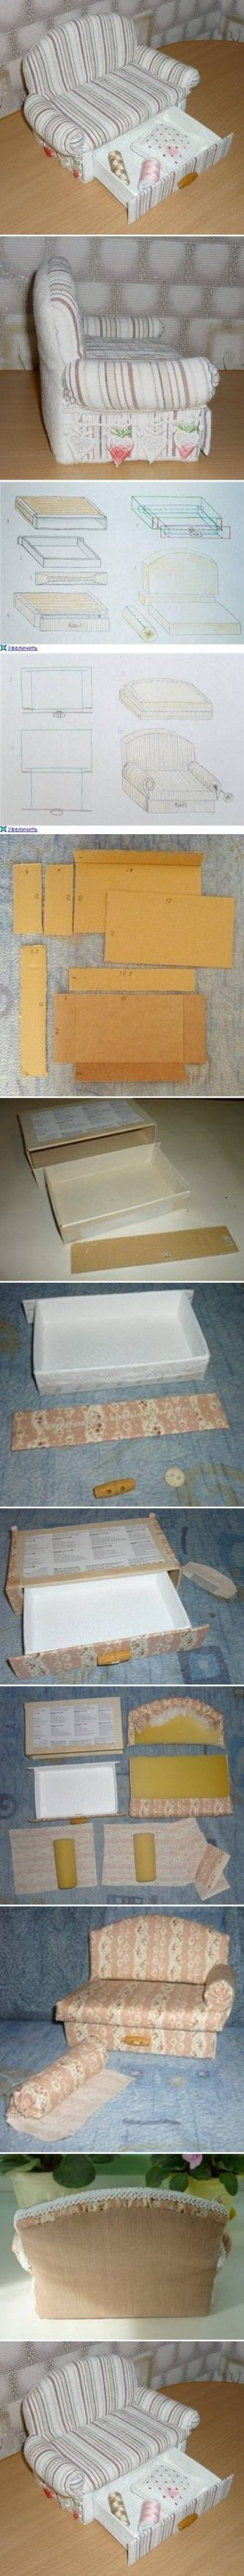 DIY Cardboard Sofa with Drawer DIY Projects